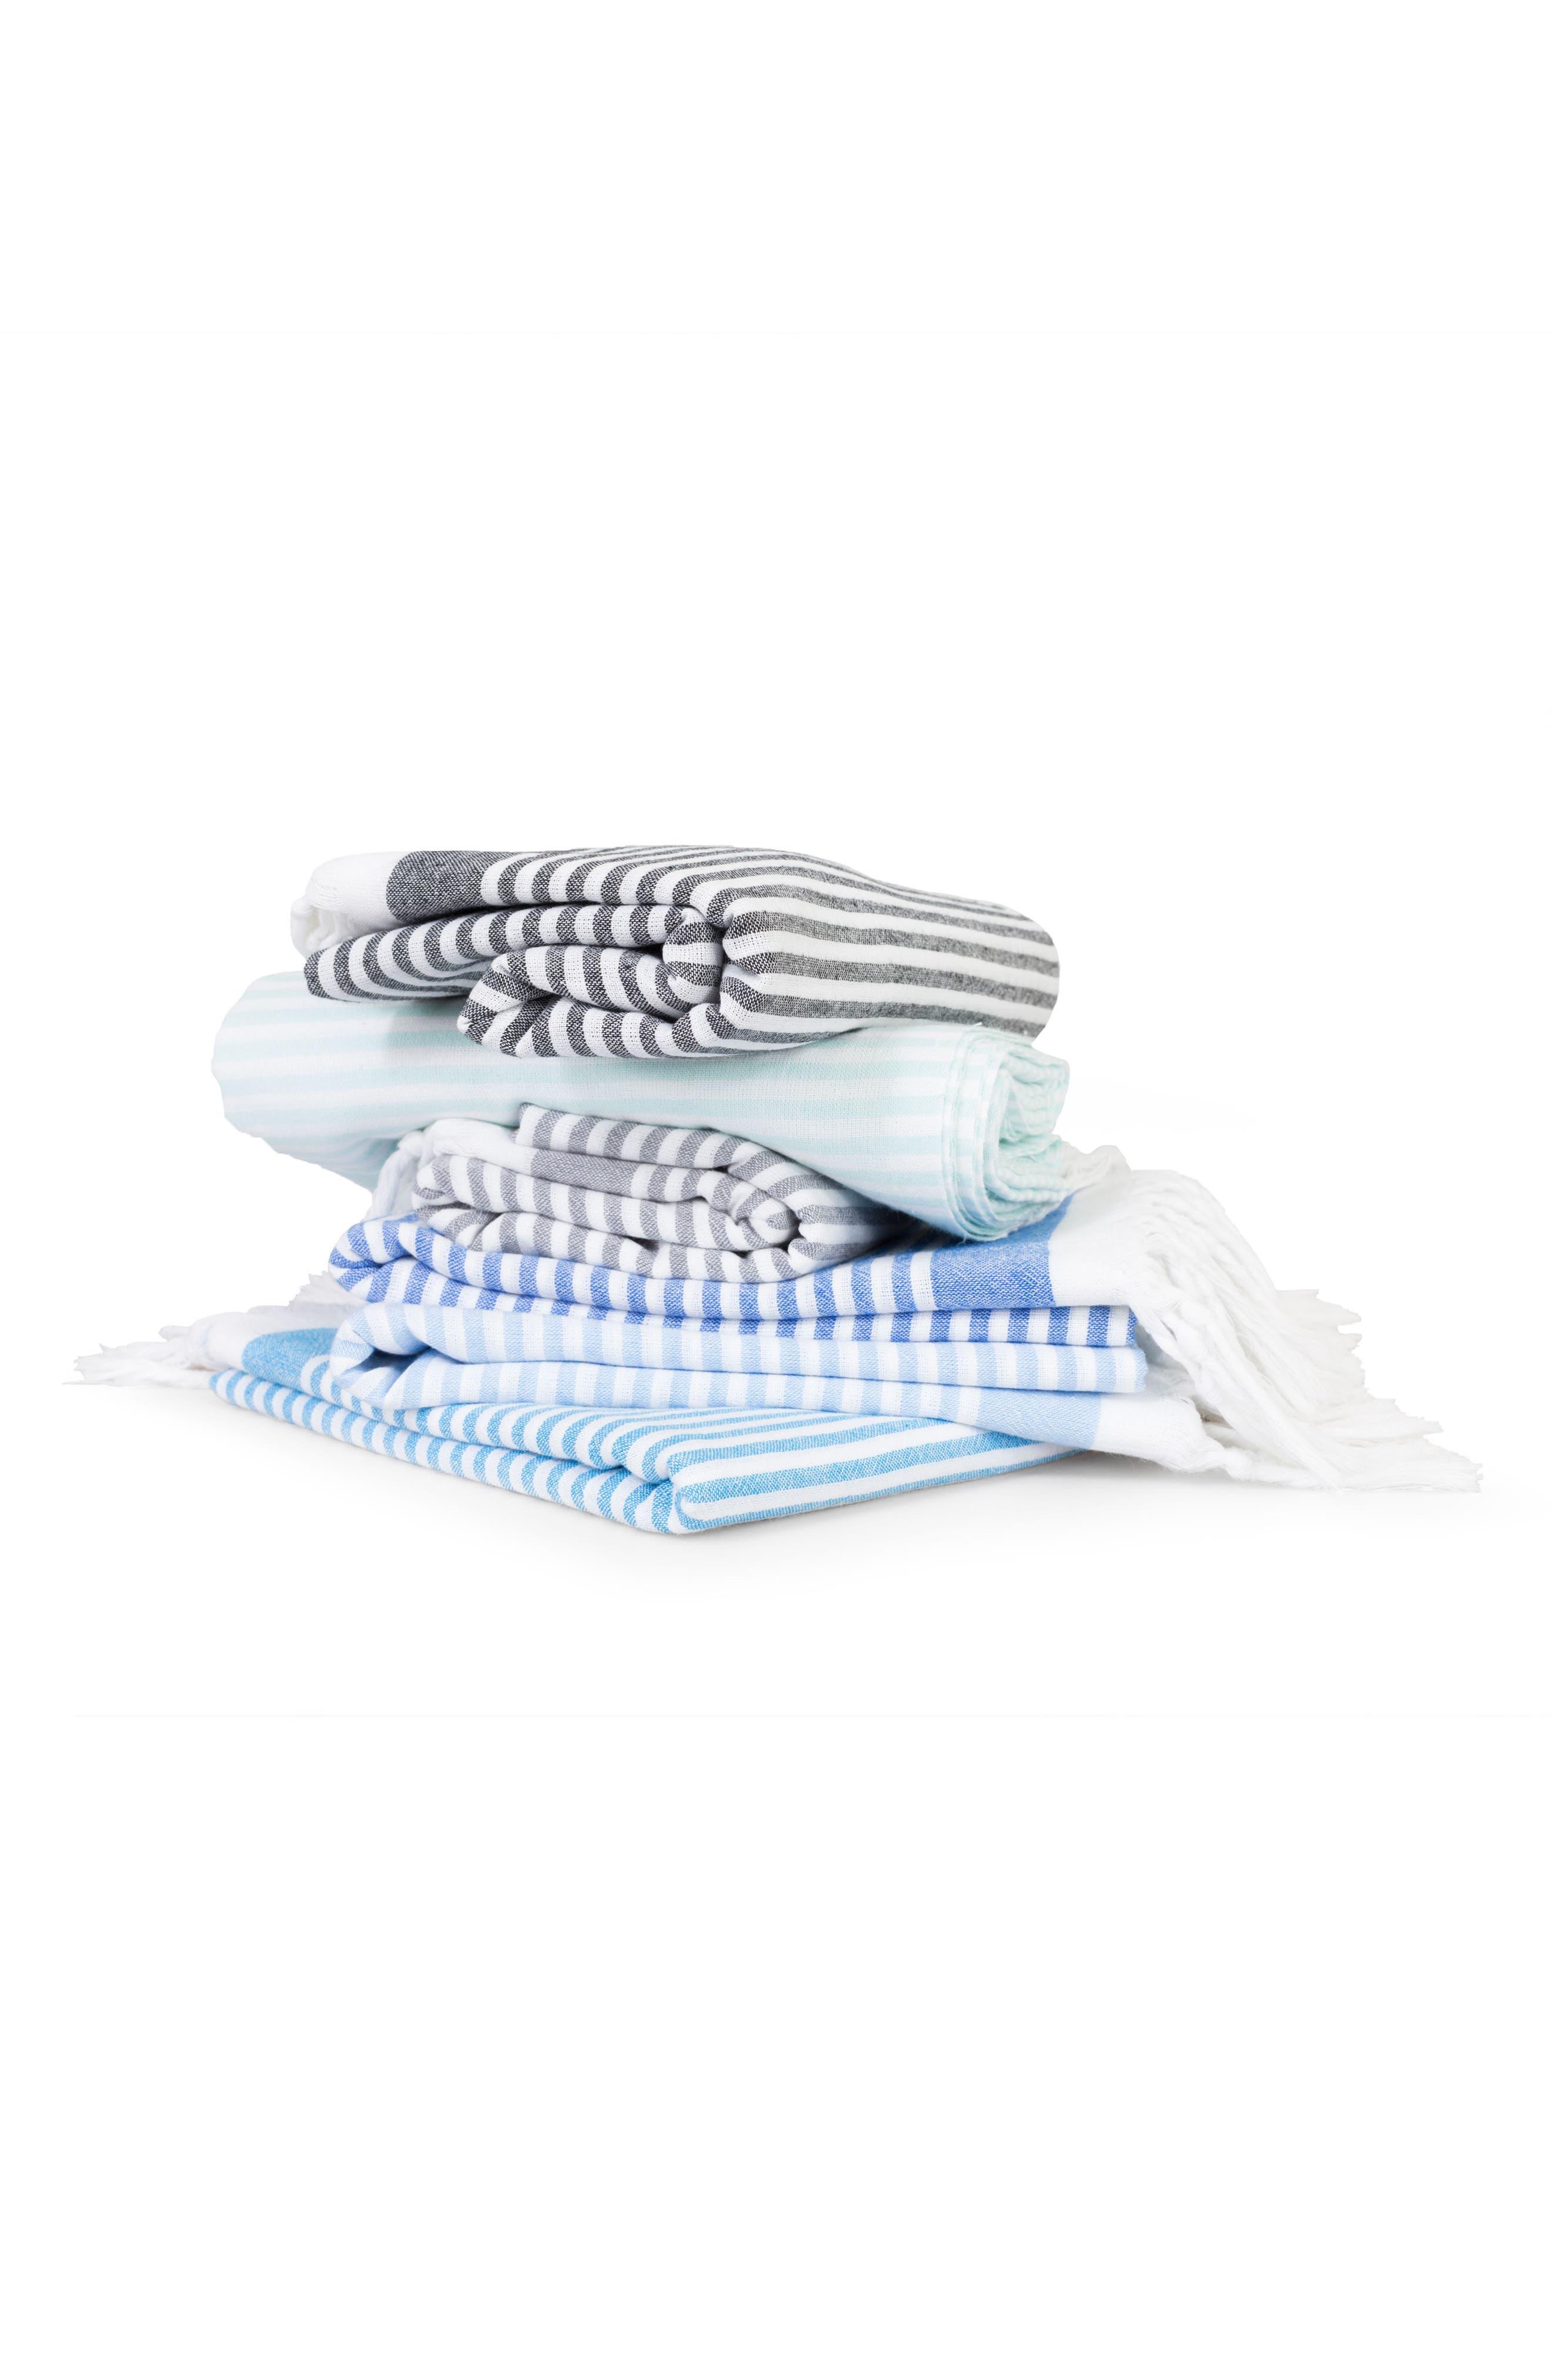 Soft Stripes Turkish Pestemal Towel,                             Alternate thumbnail 3, color,                             Sky Blue